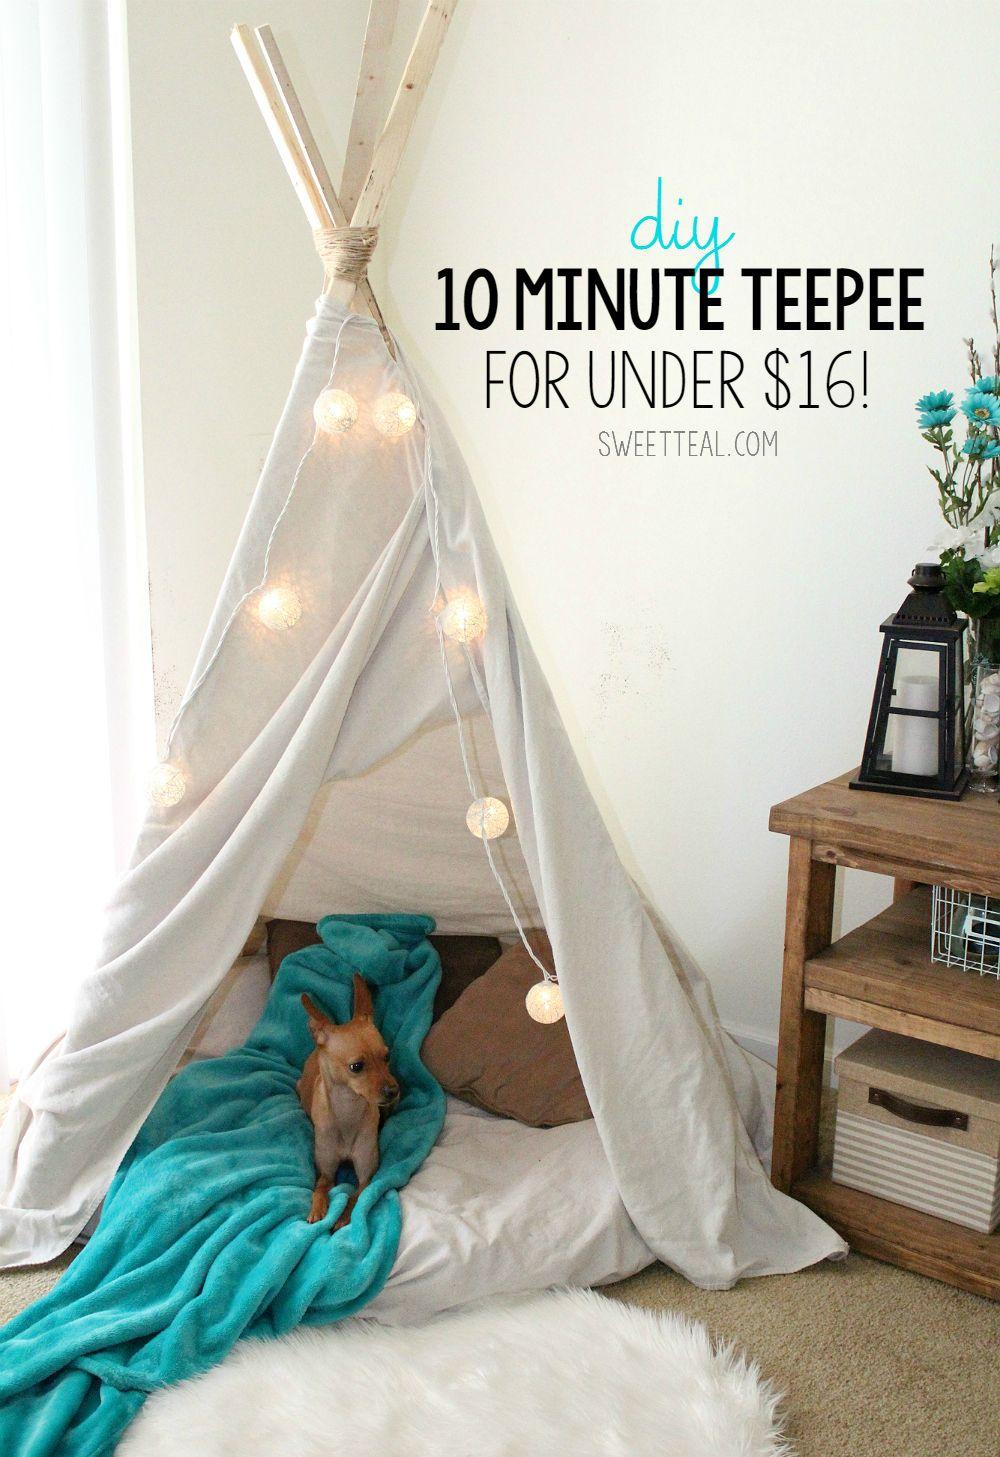 DIY 10 Minute Teepee for Under $16 & DIY 10 Minute Teepee for Under $16 | Tutorials Easy and Diy teepee